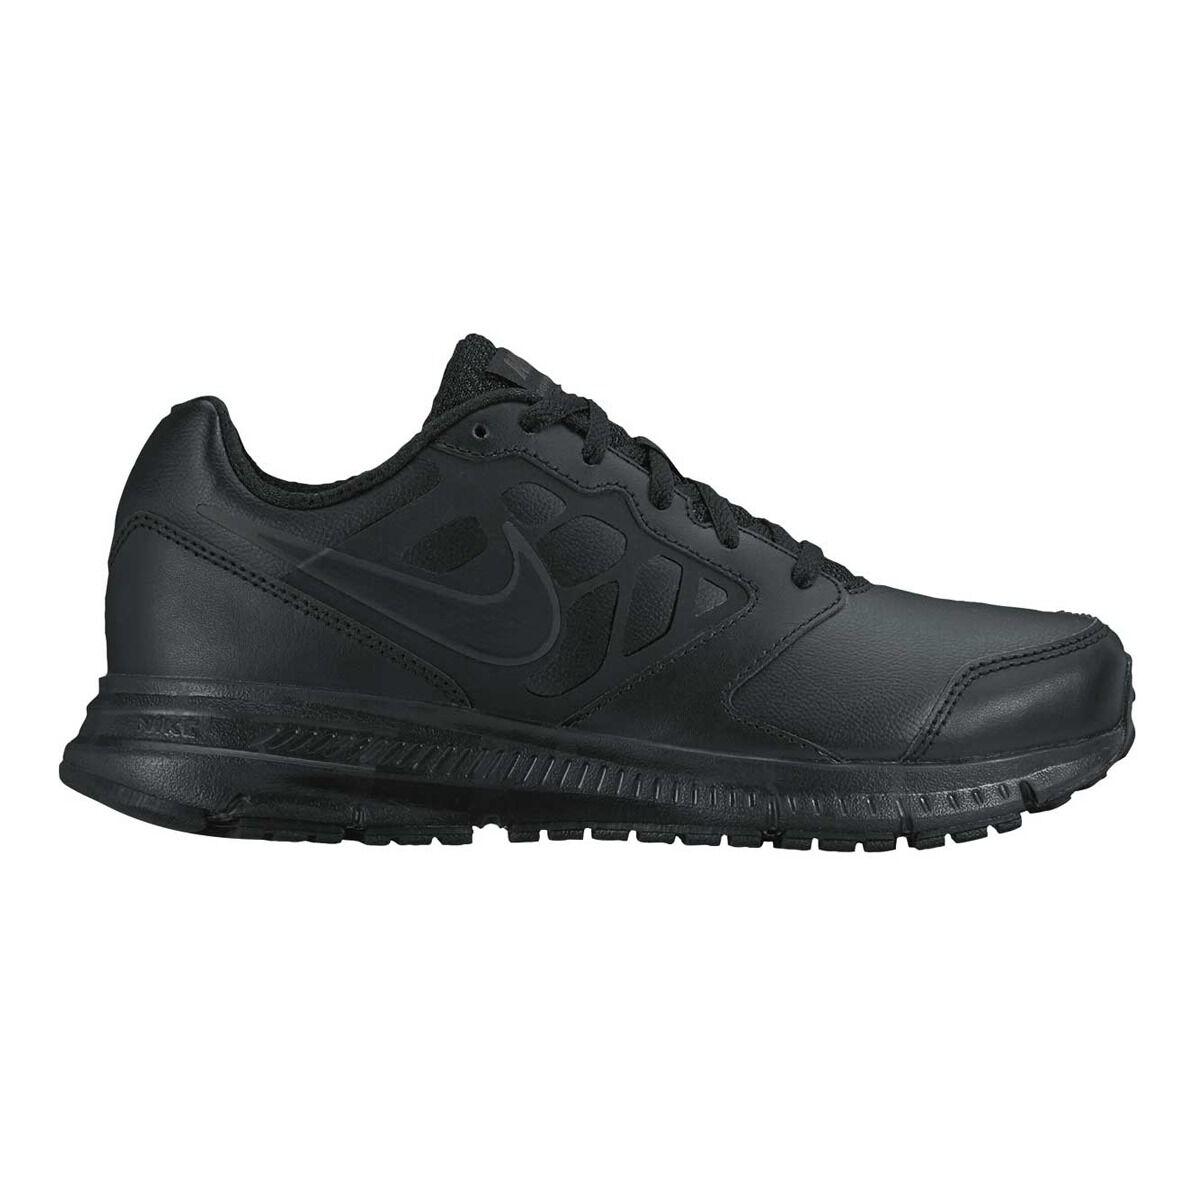 6 Sport Boys Shoes Black Nike Downshifter Us Running 11Rebel nP8O0wk